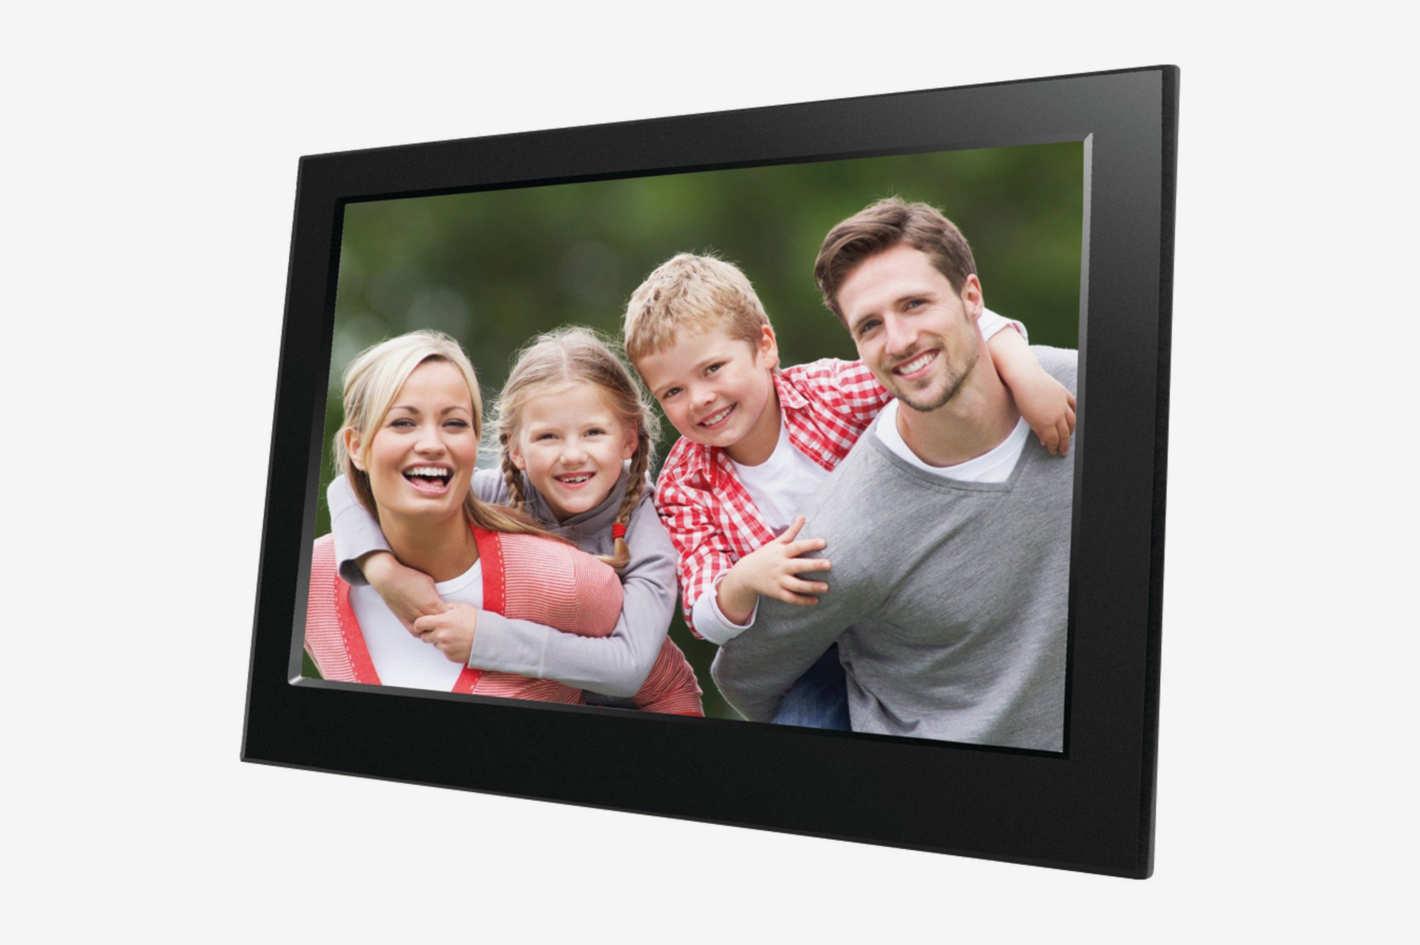 Naxa Nf-900 Tft/led Digital Photo Frame